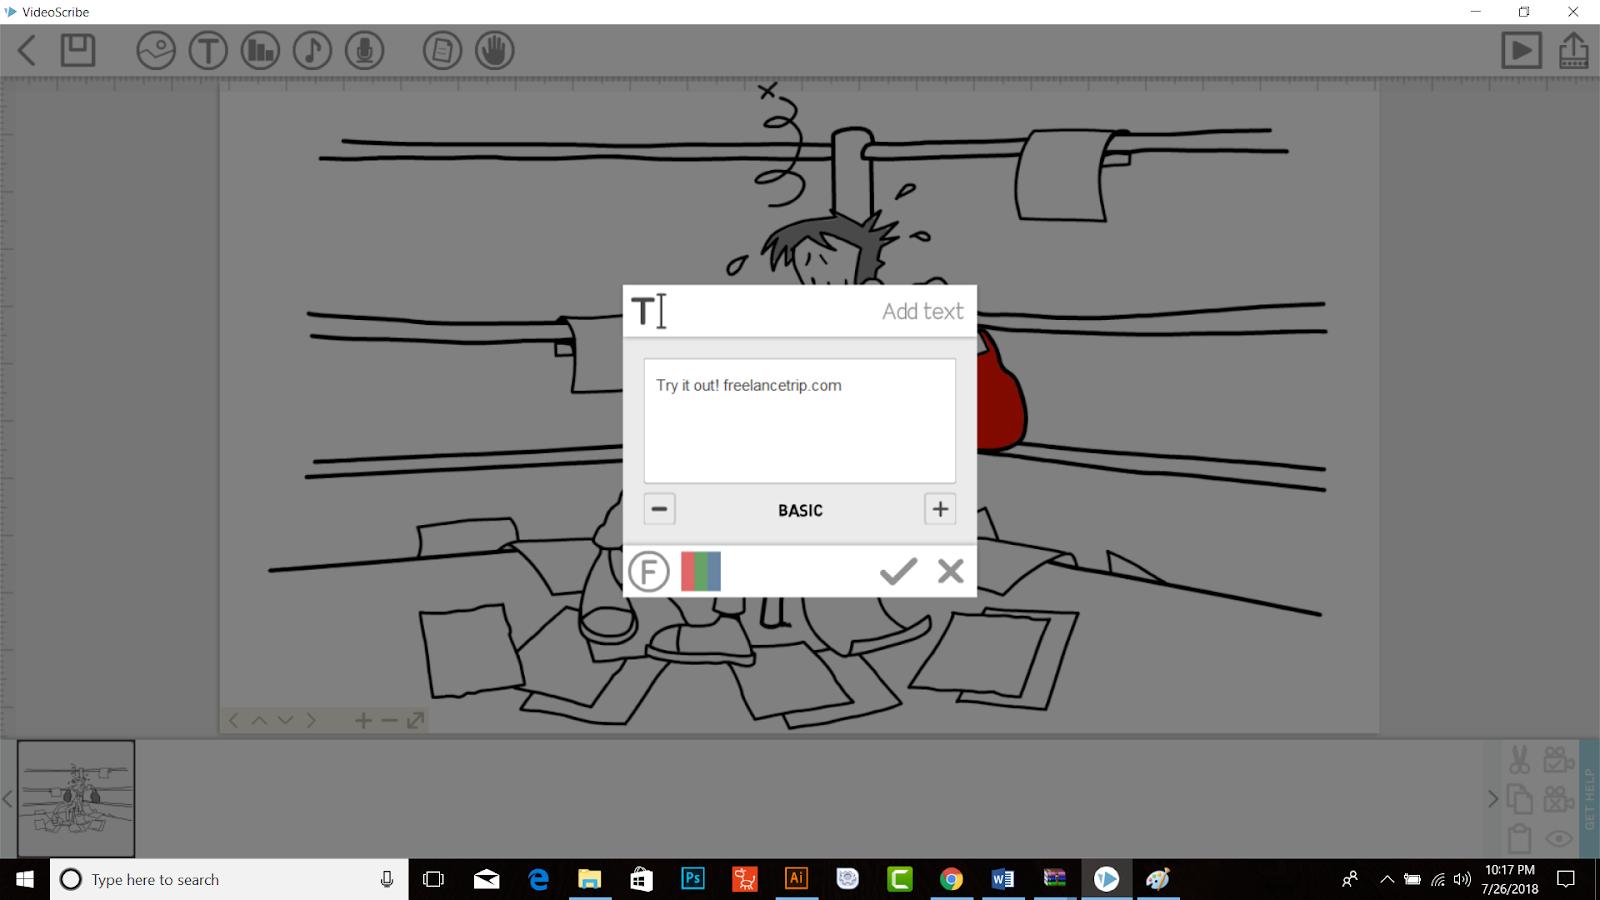 Whiteboard Animation Tools - Videoscribe - Freelance Trip